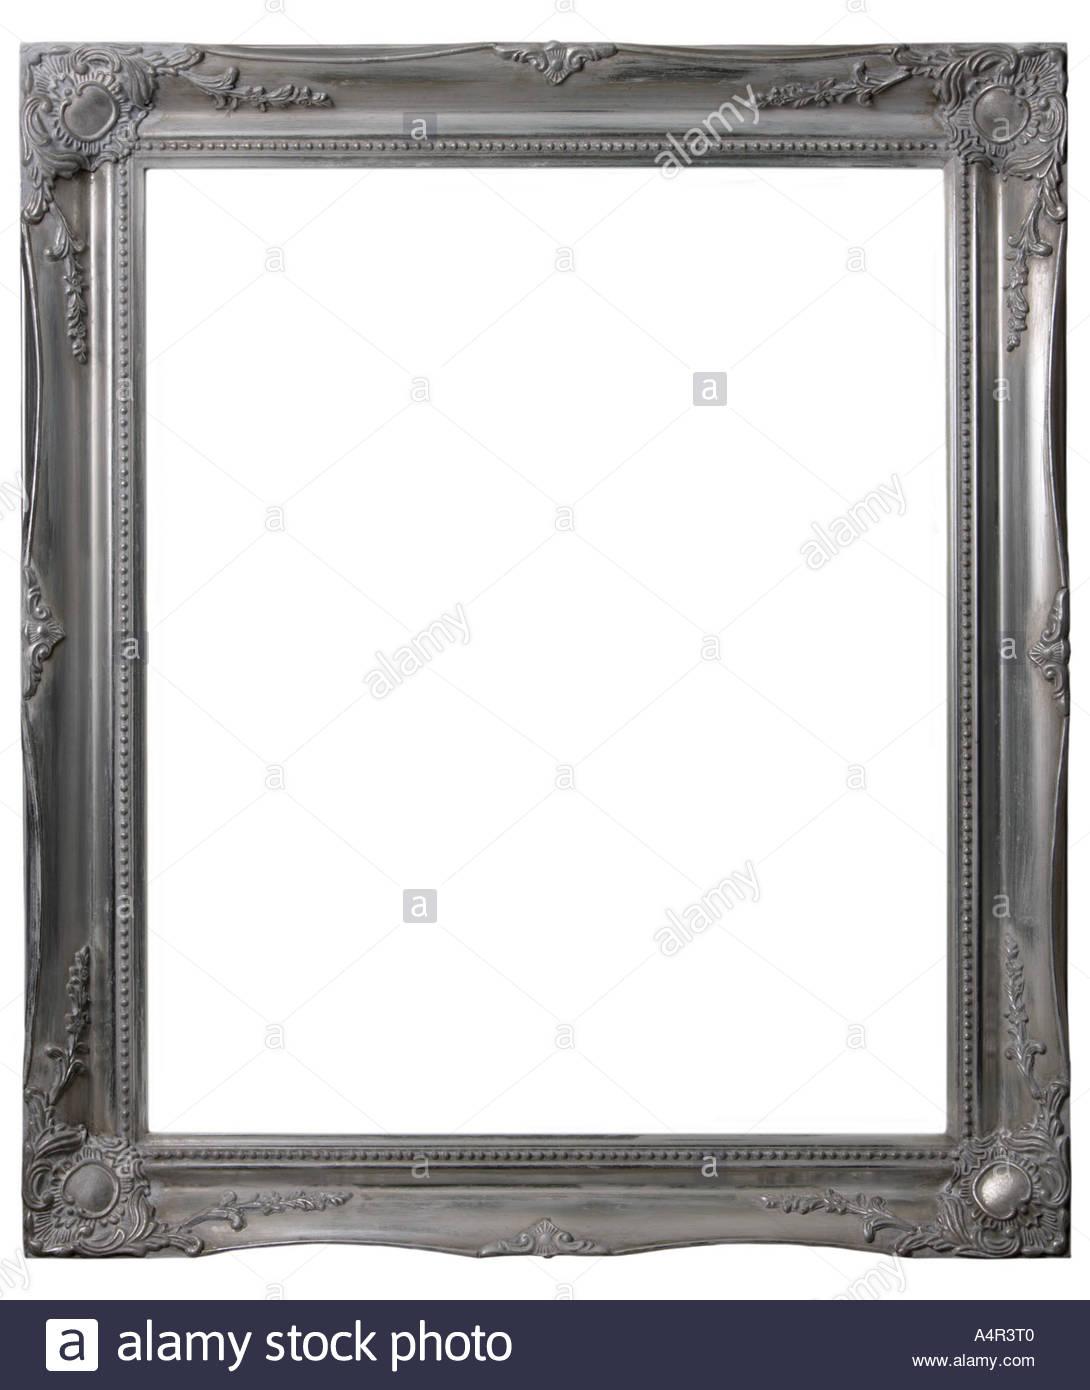 Mirror Ornate Silver Frame Stock Photos & Mirror Ornate Silver Frame ...